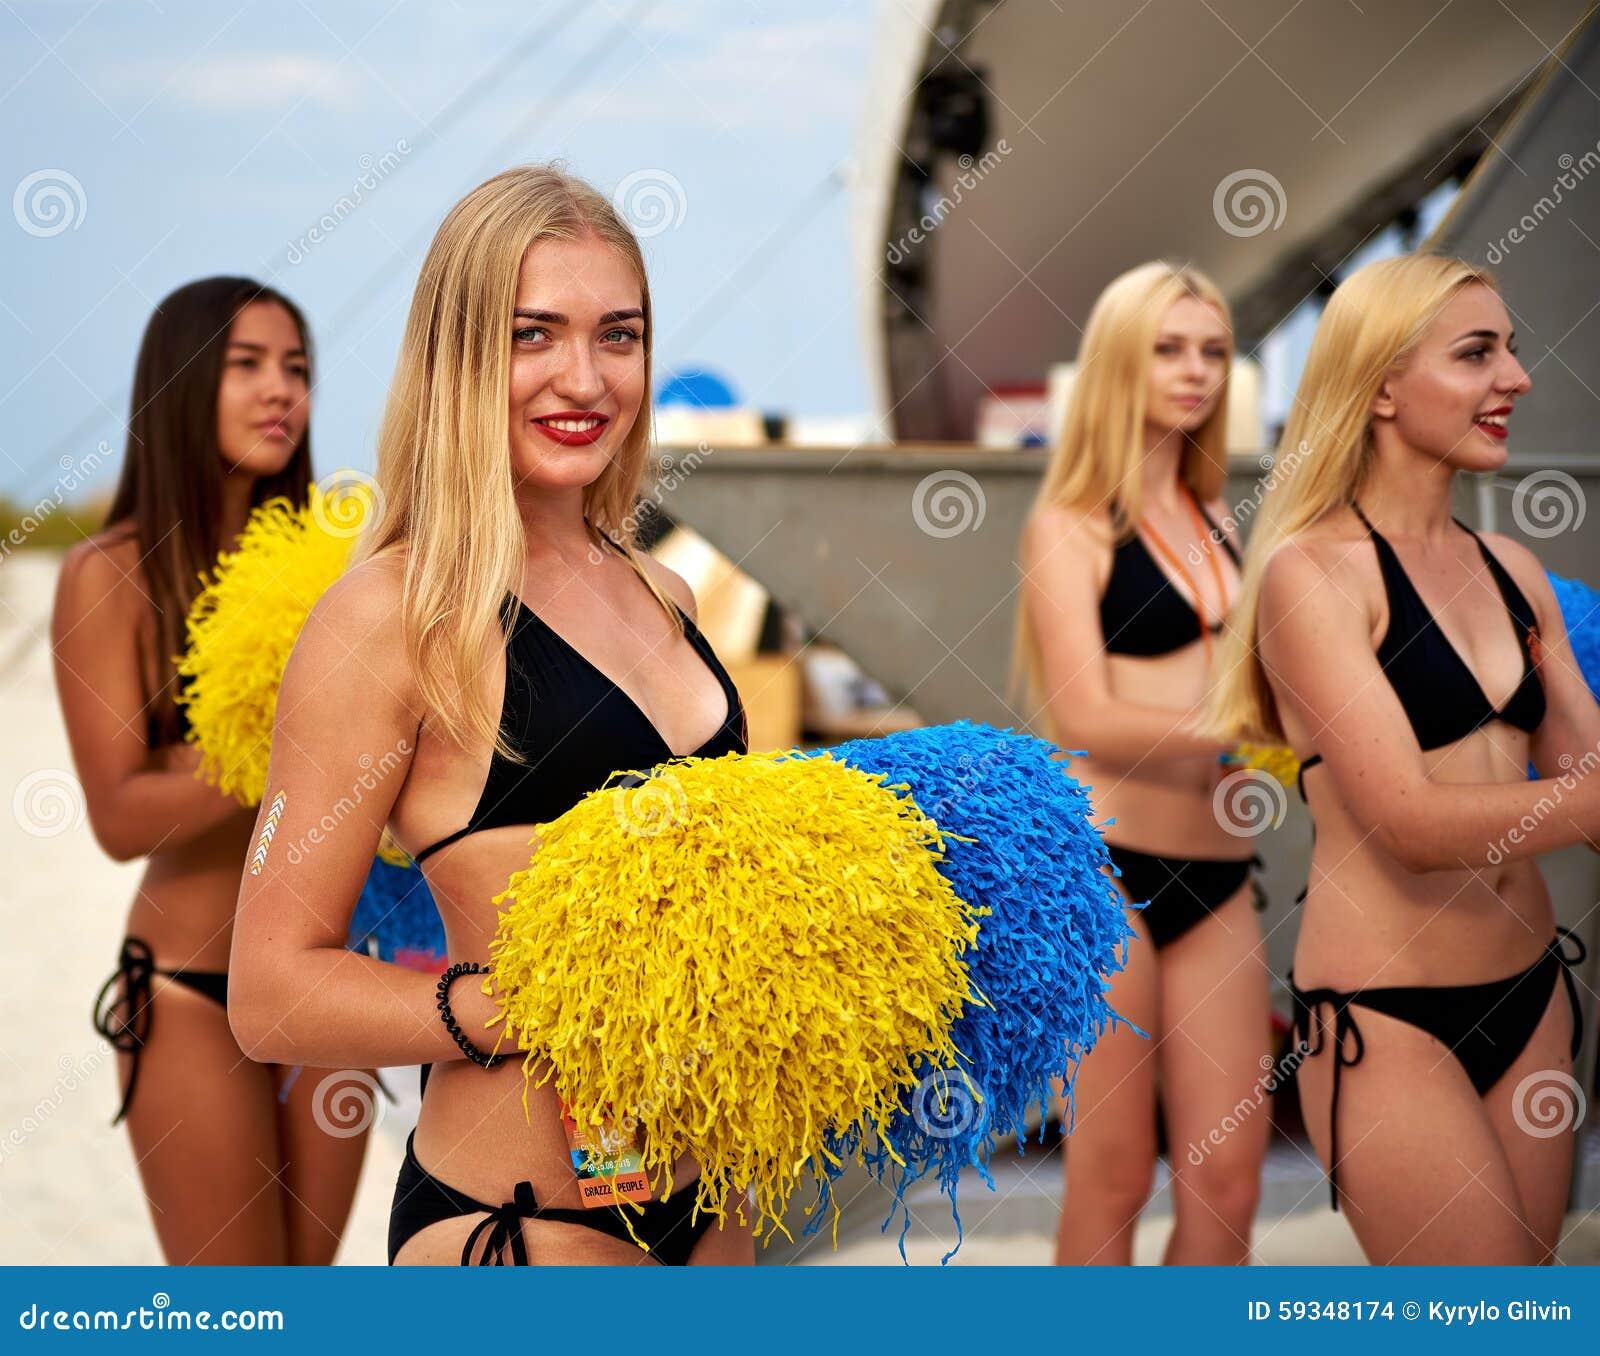 dating.com ukraine women black people